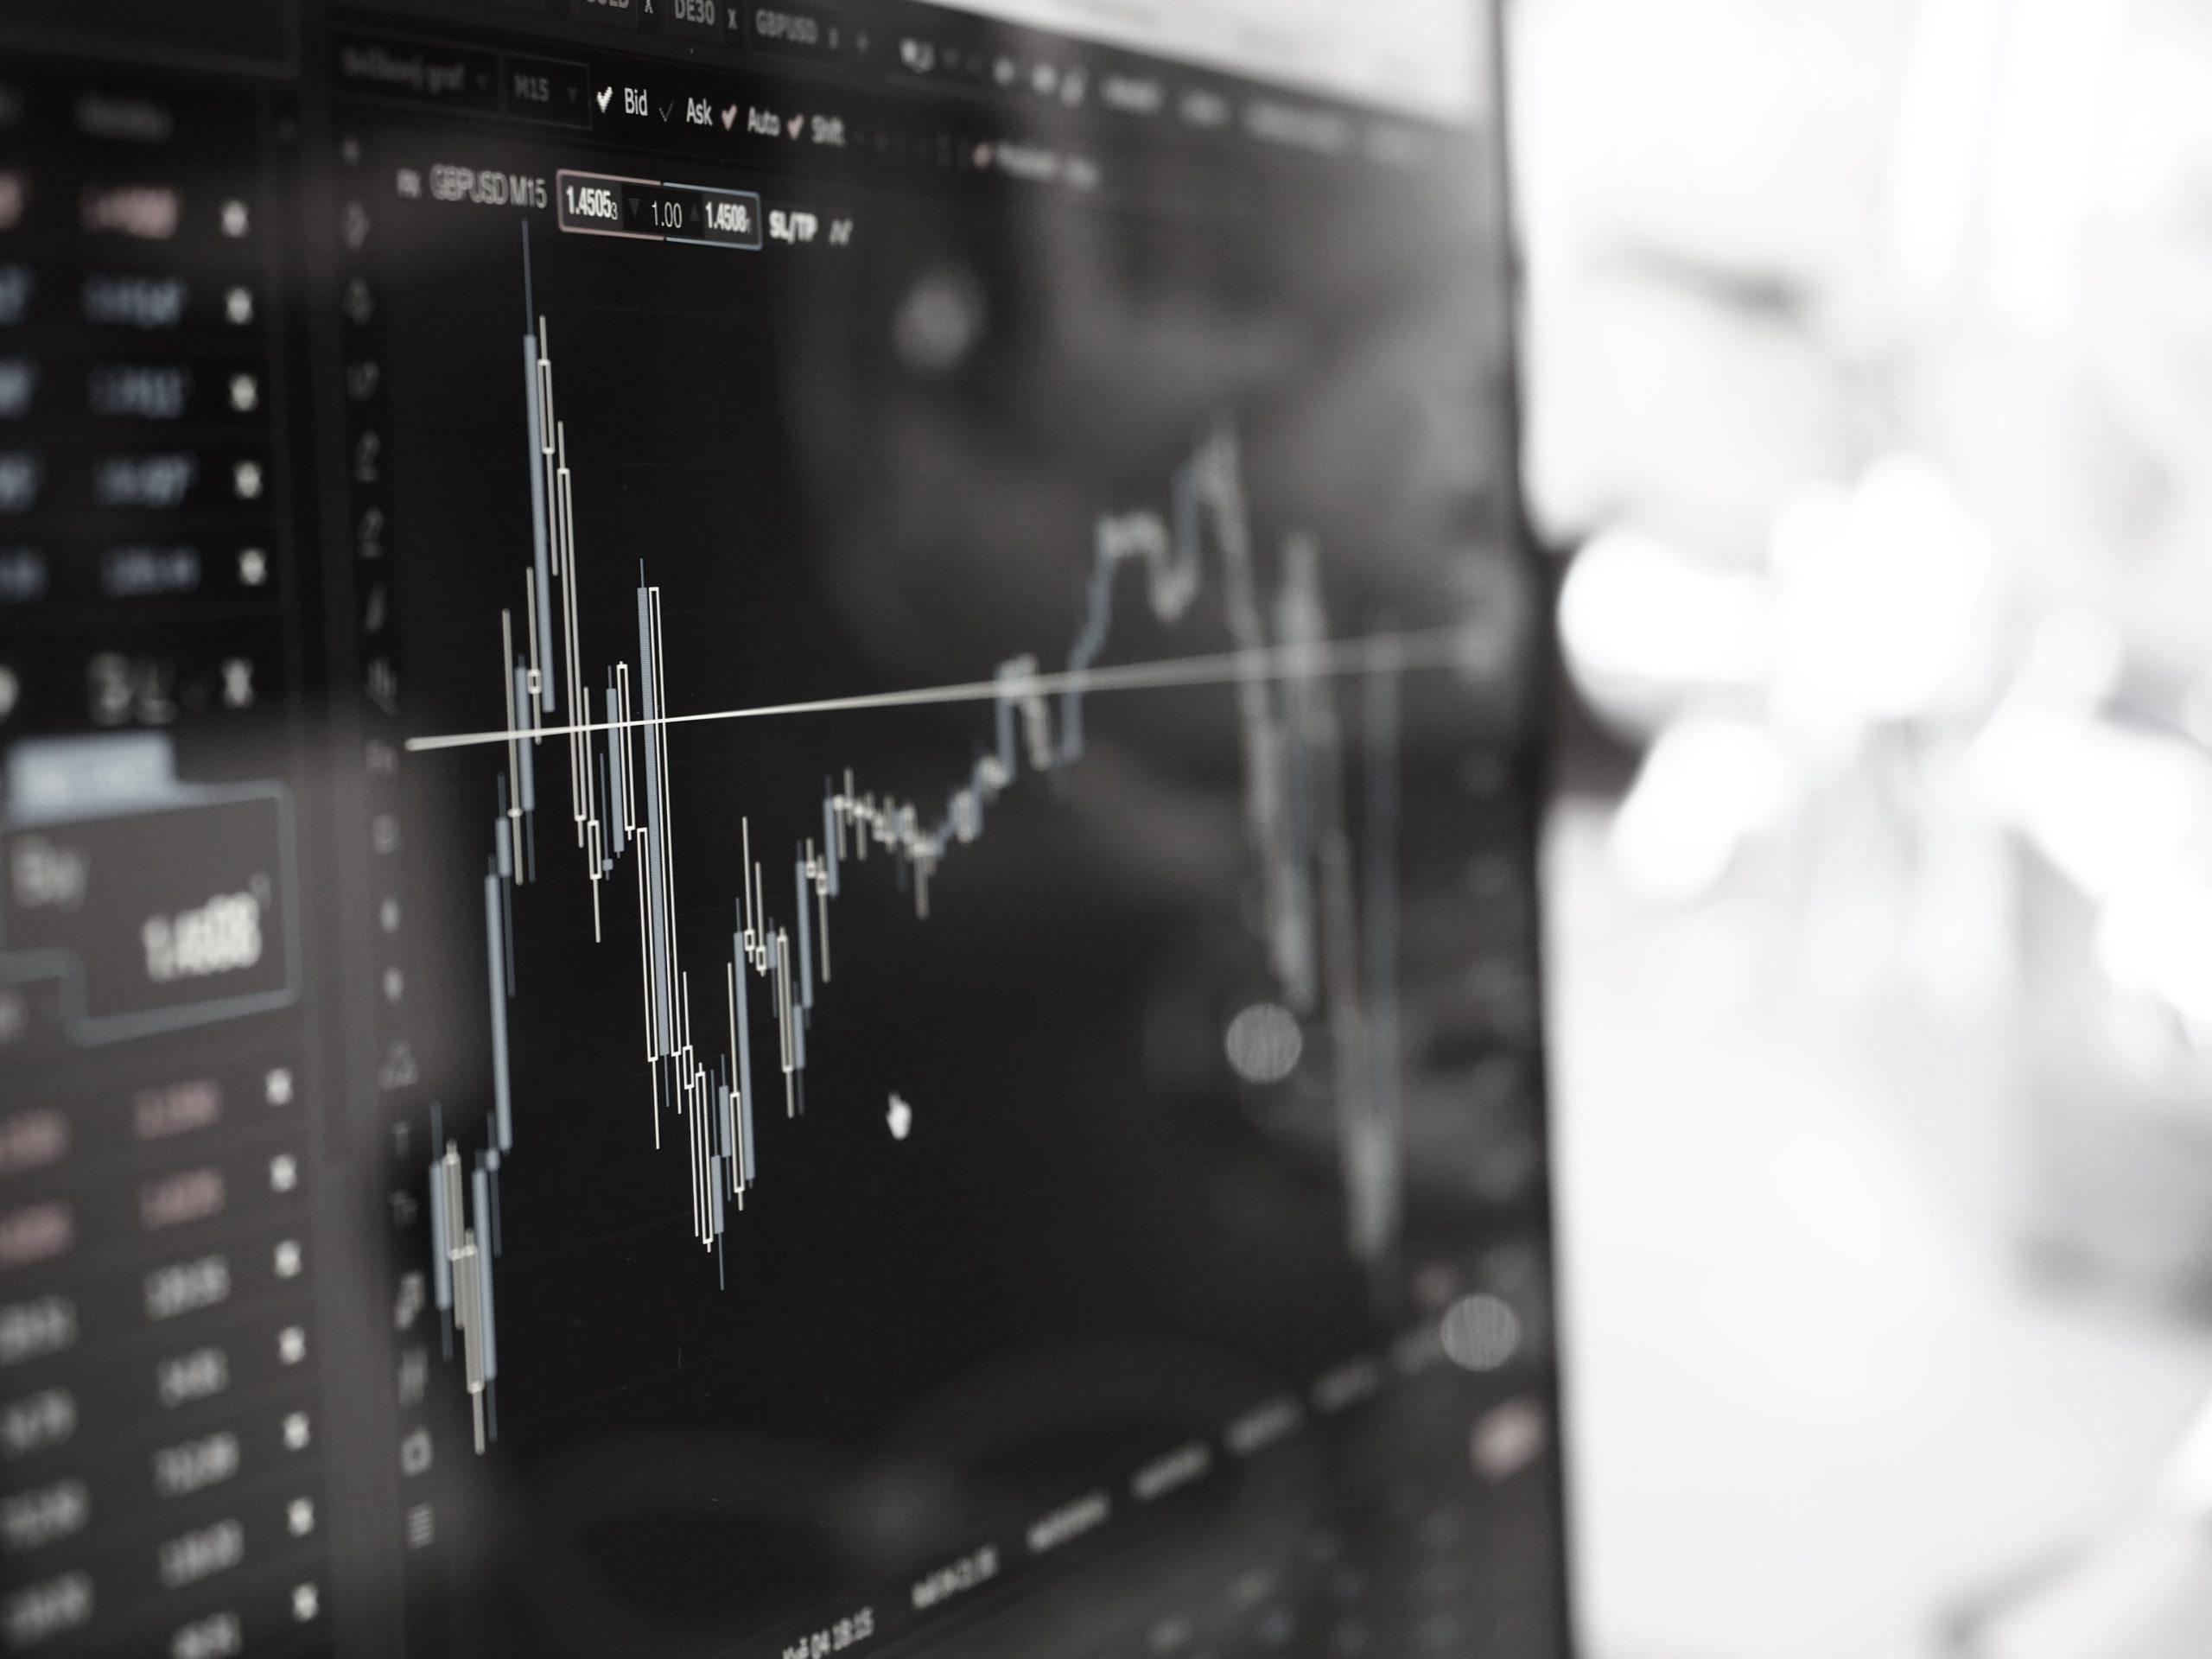 Conseil en investissement financier